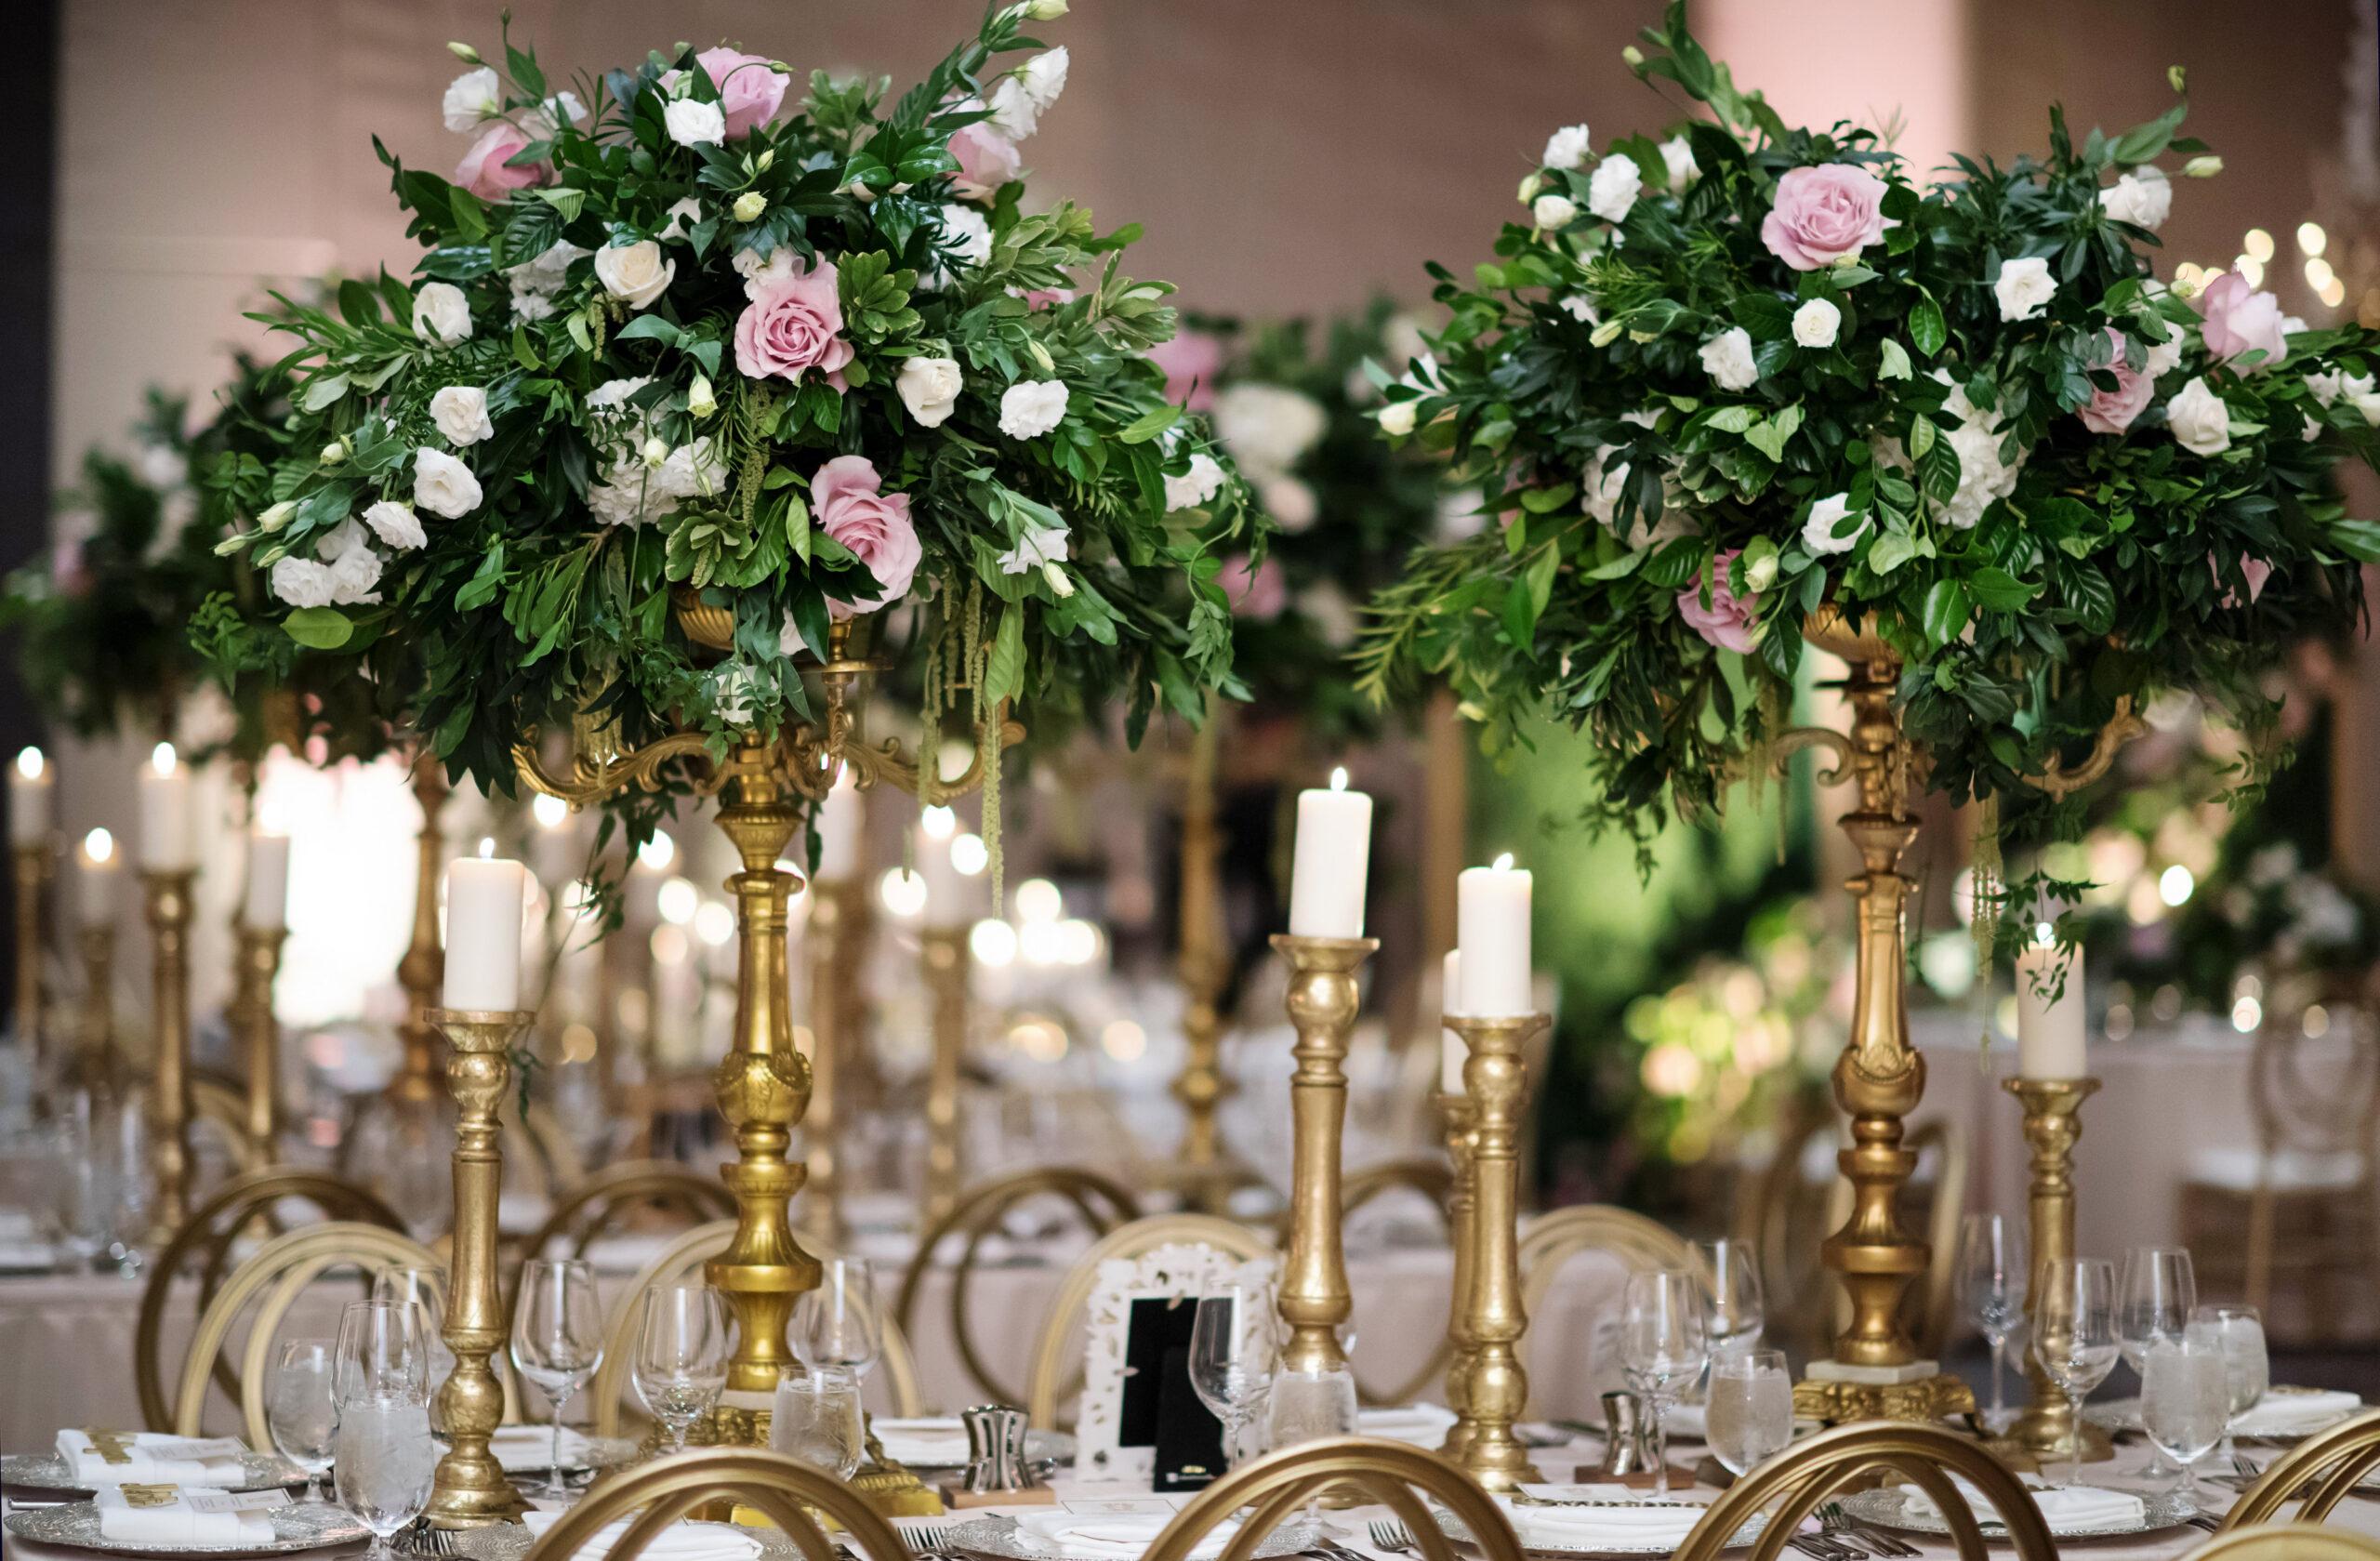 https://secureservercdn.net/45.40.145.151/kgq.ab5.myftpupload.com/wp-content/uploads/2020/04/Sanam-Soroush-s-Wedding-wedluxe-submission-0090-scaled.jpg?time=1627956768